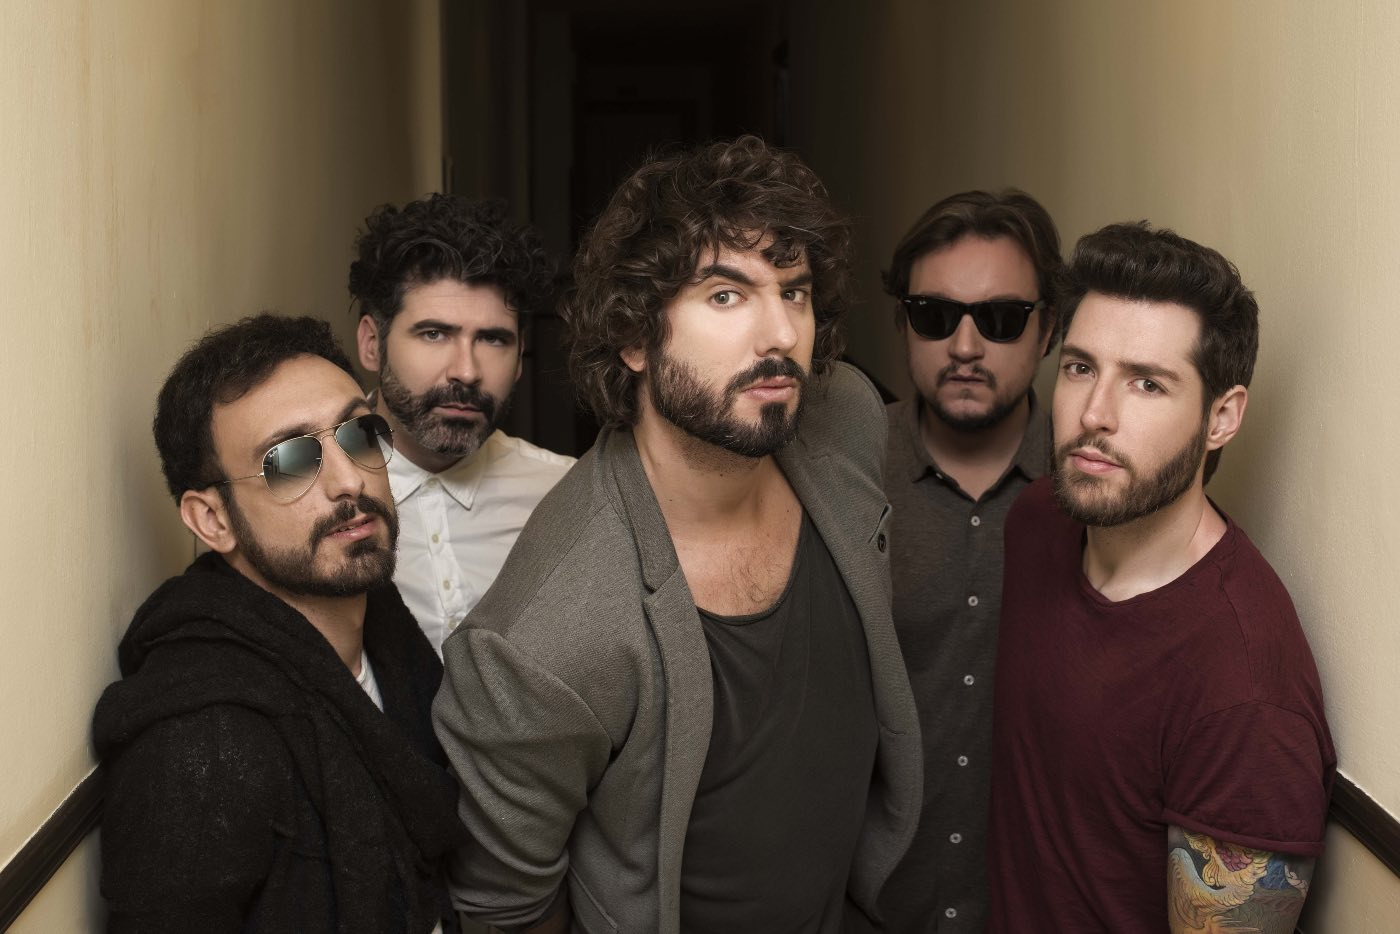 Izal, Miss Caffeina, Él Mató y más de sesenta artistas en Cosquín Rock Online